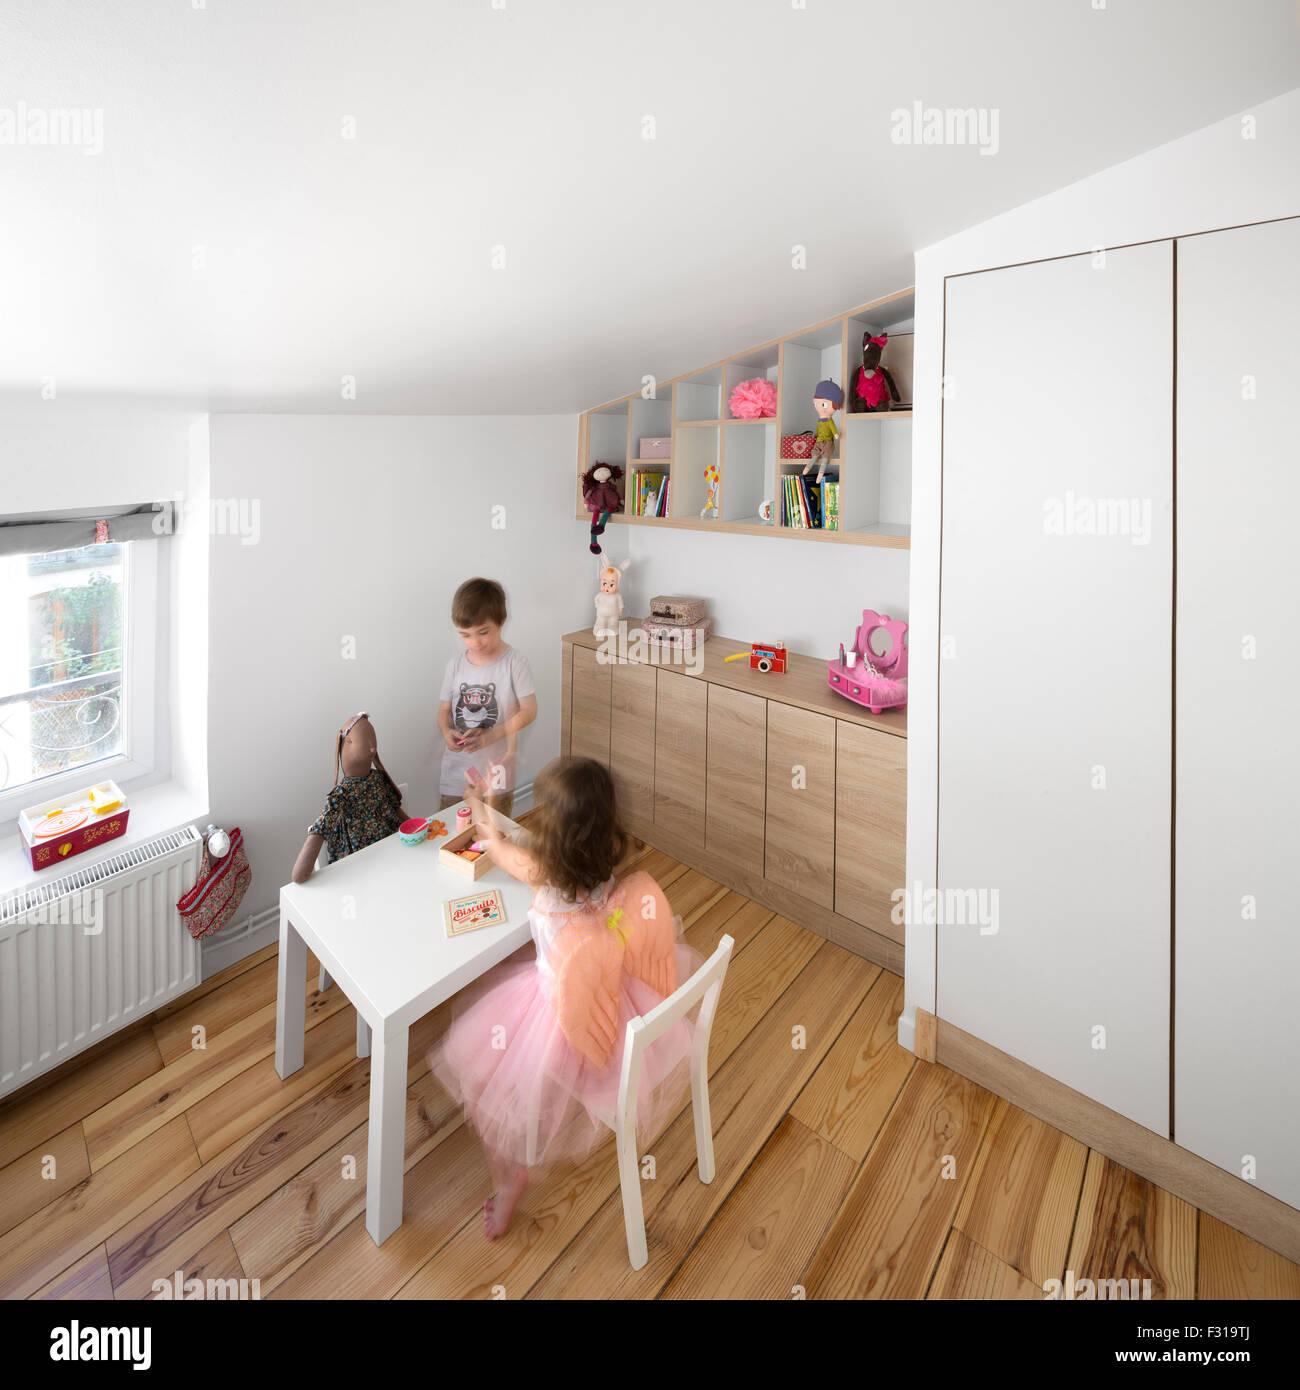 A Childu0027s Small Space Bedroom (France). Petite Chambre Du0027enfant (France).